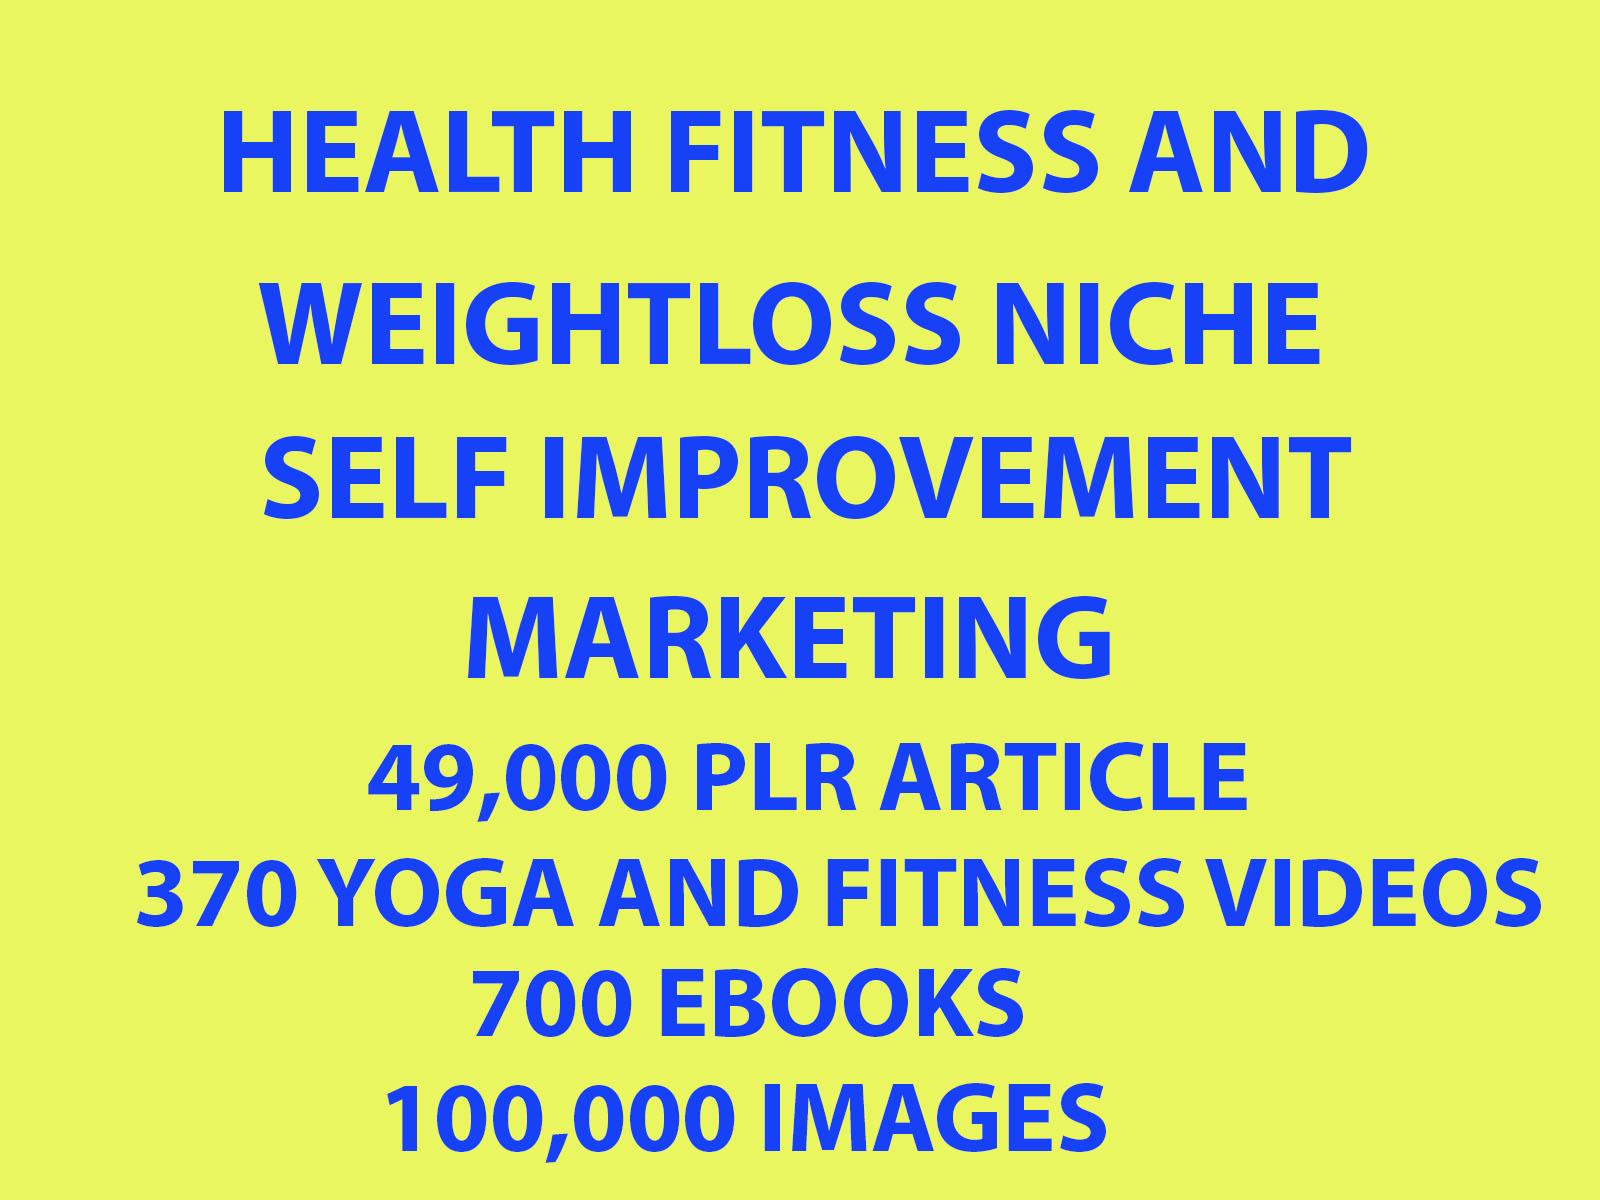 49 000 Plr Articles, 700 Ebooks 100k Images, 370 Videos On Health Fitnes